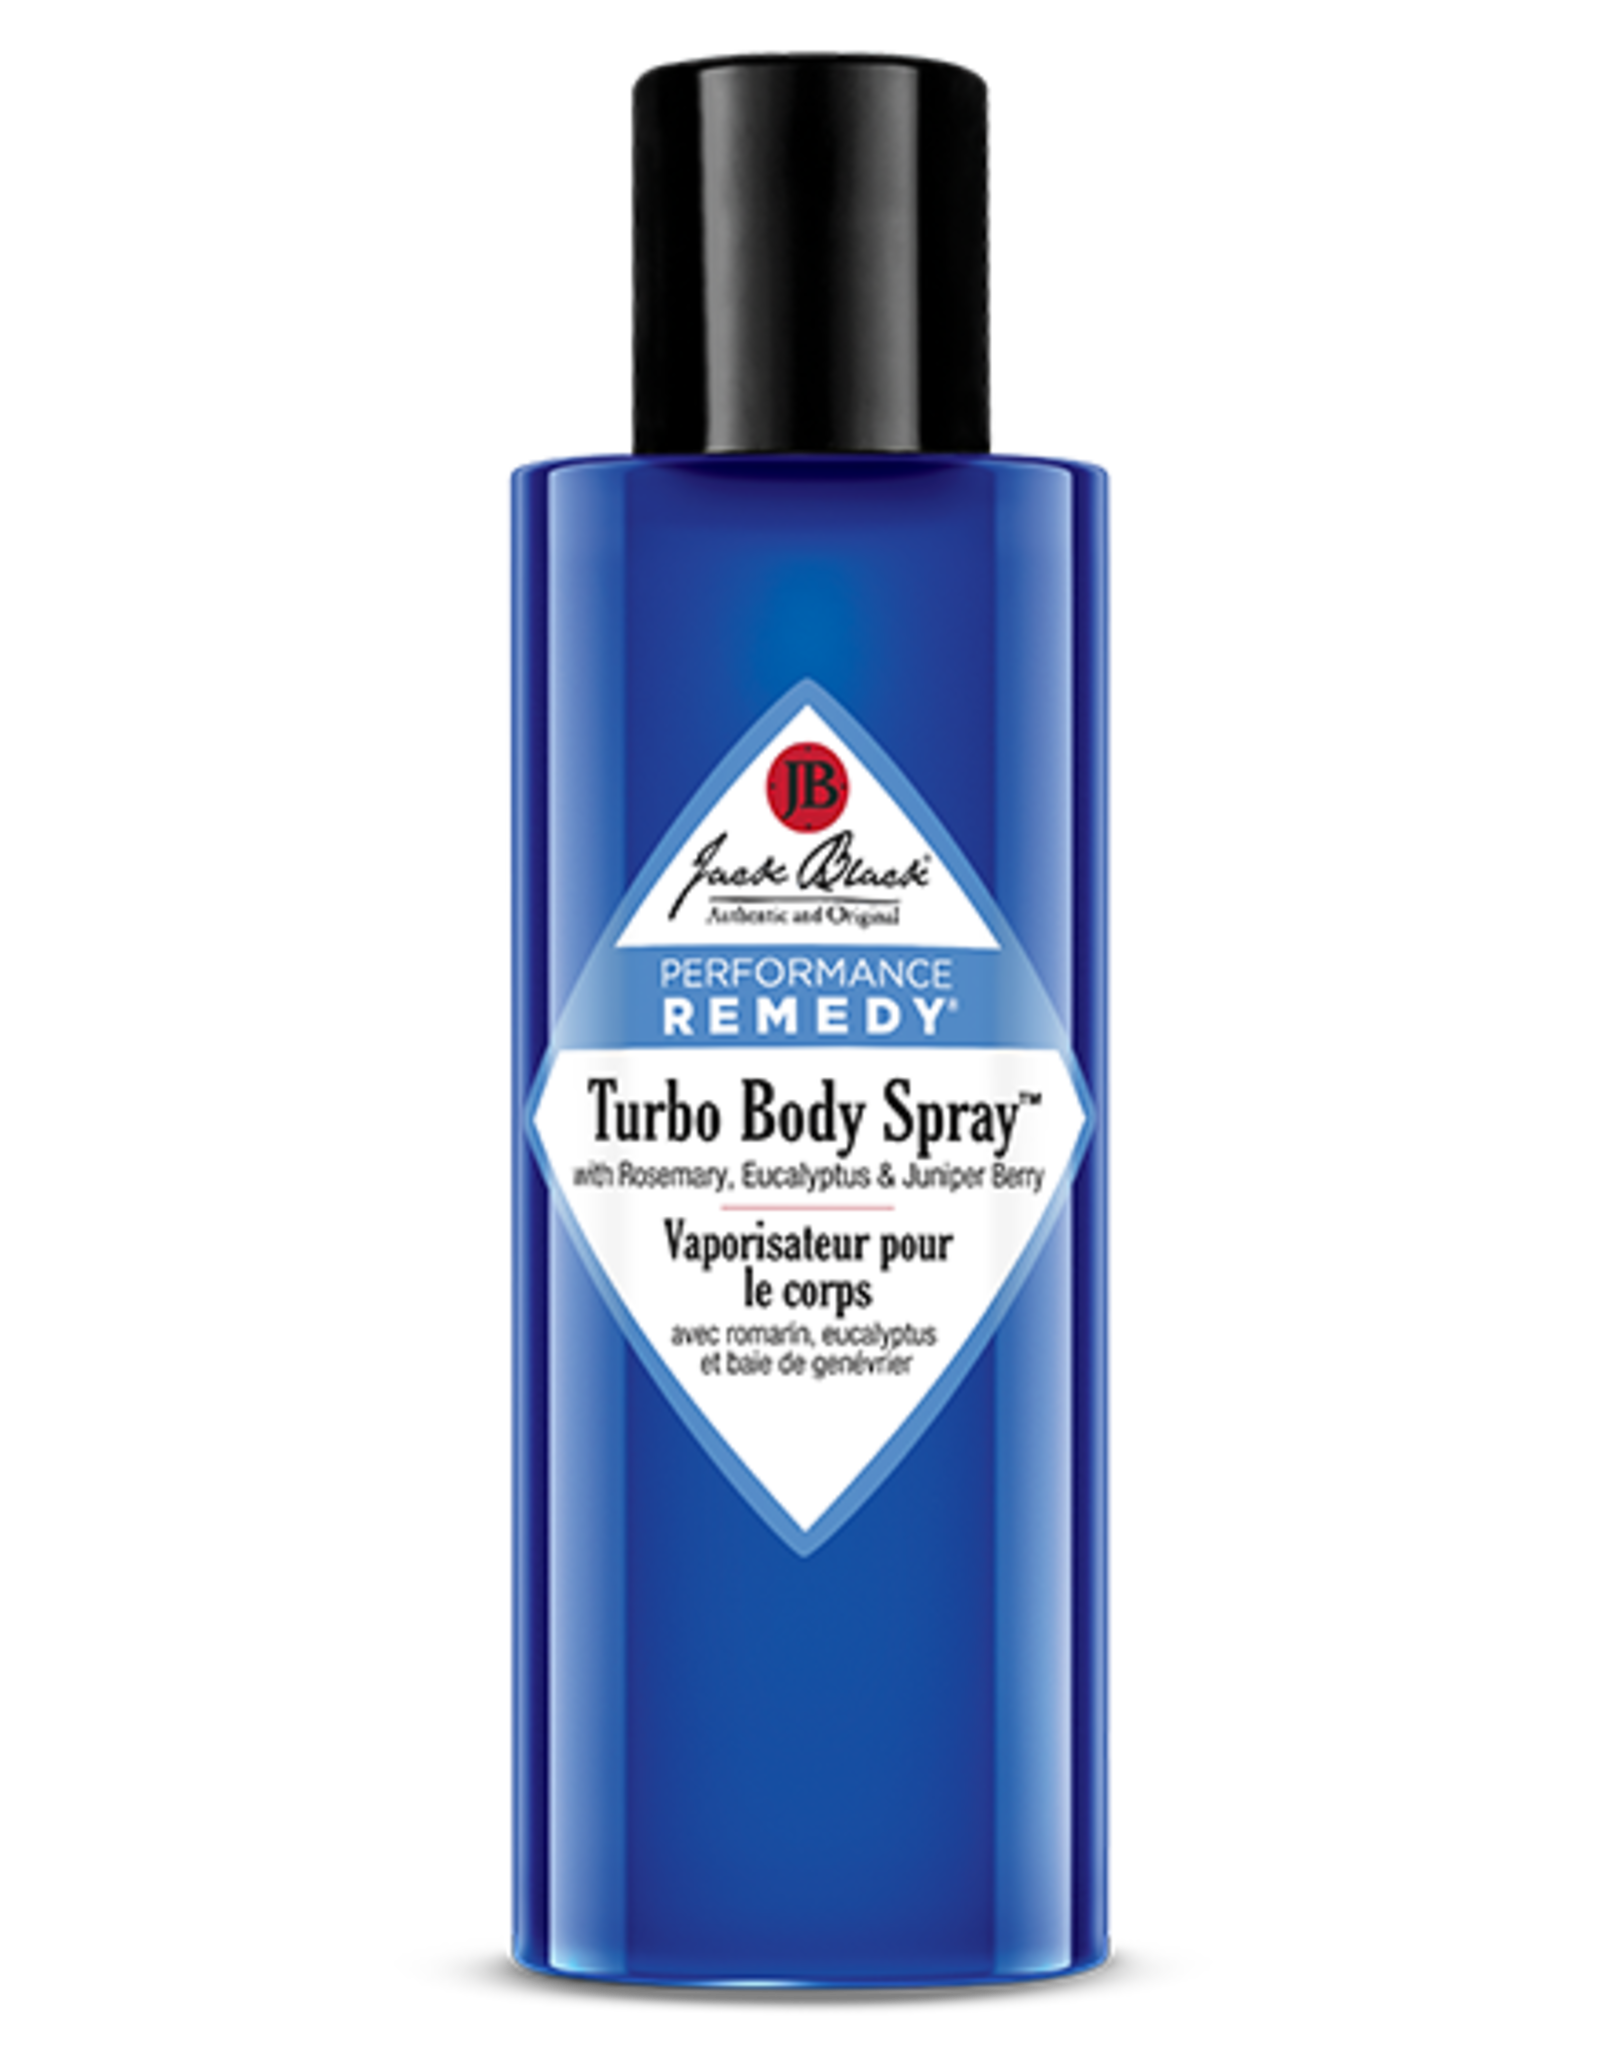 Turbo Body Spray